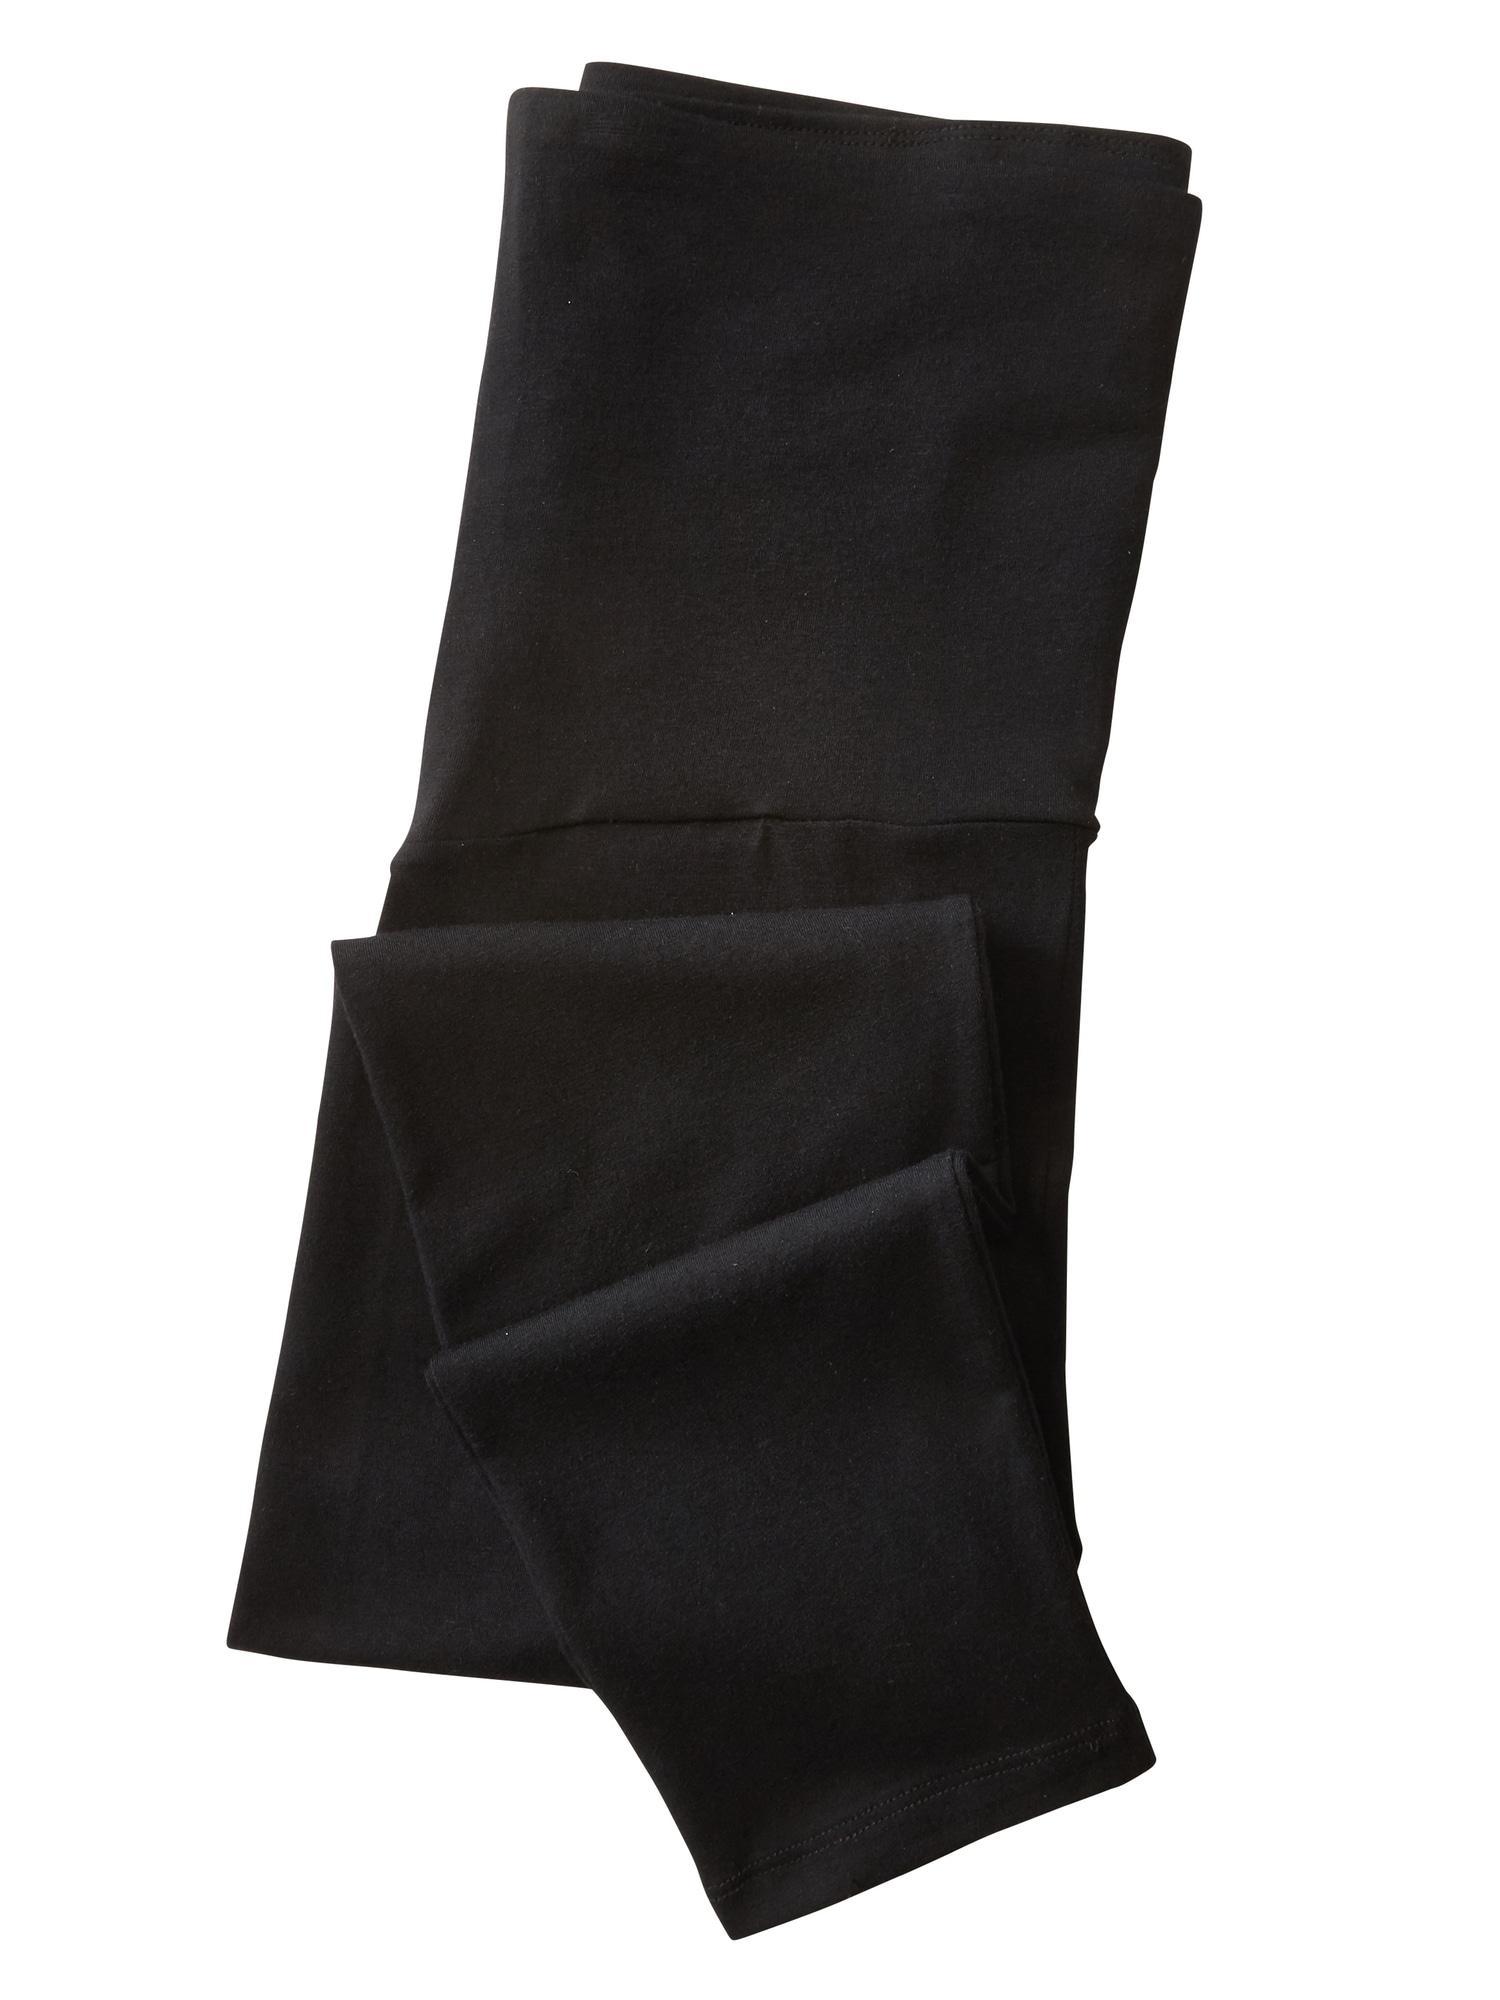 ad4e4a949a4c6 GAP Factory - Black Maternity Pure Body Full Panel Capri leggings - Lyst.  View fullscreen